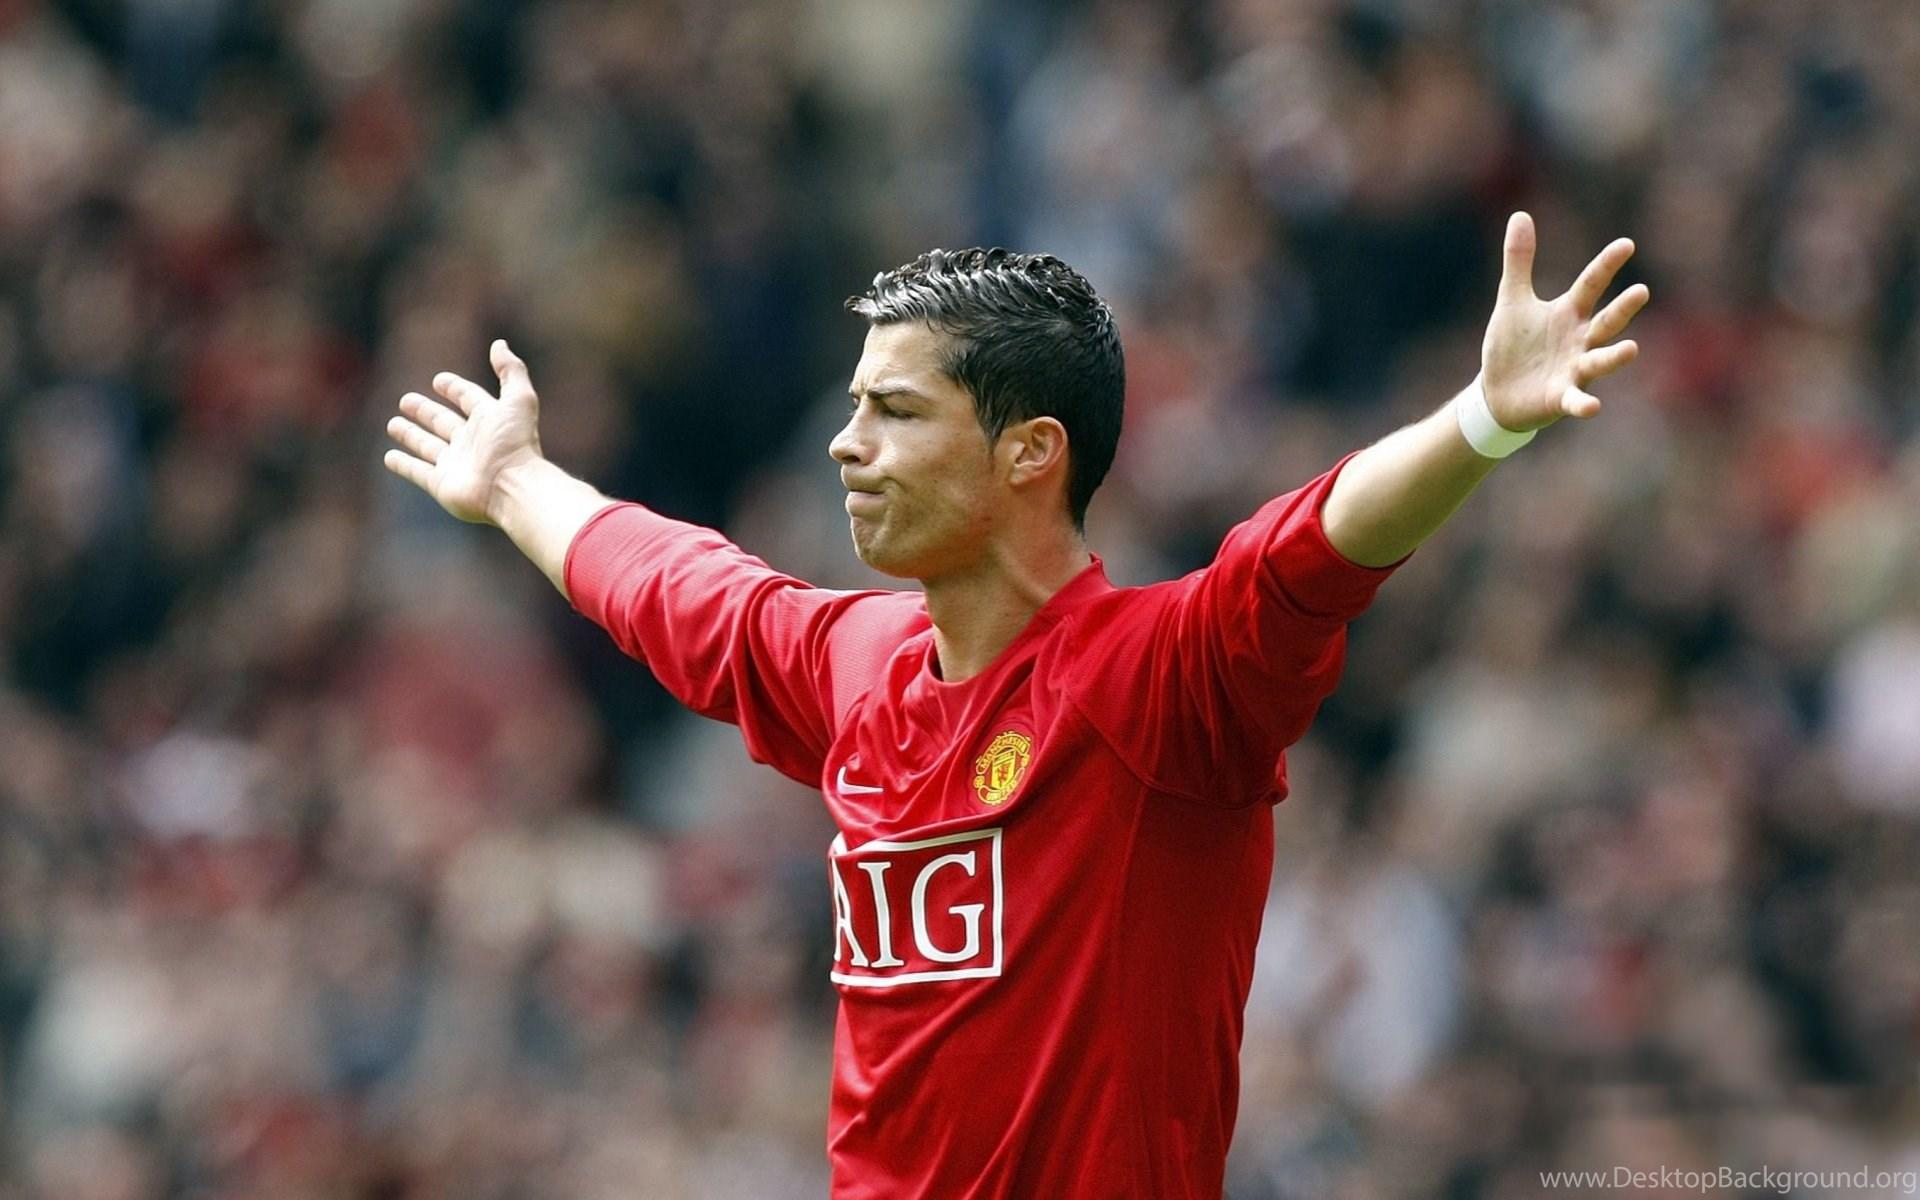 Cristiano Ronaldo Manchester United Wallpapers For Widescreen